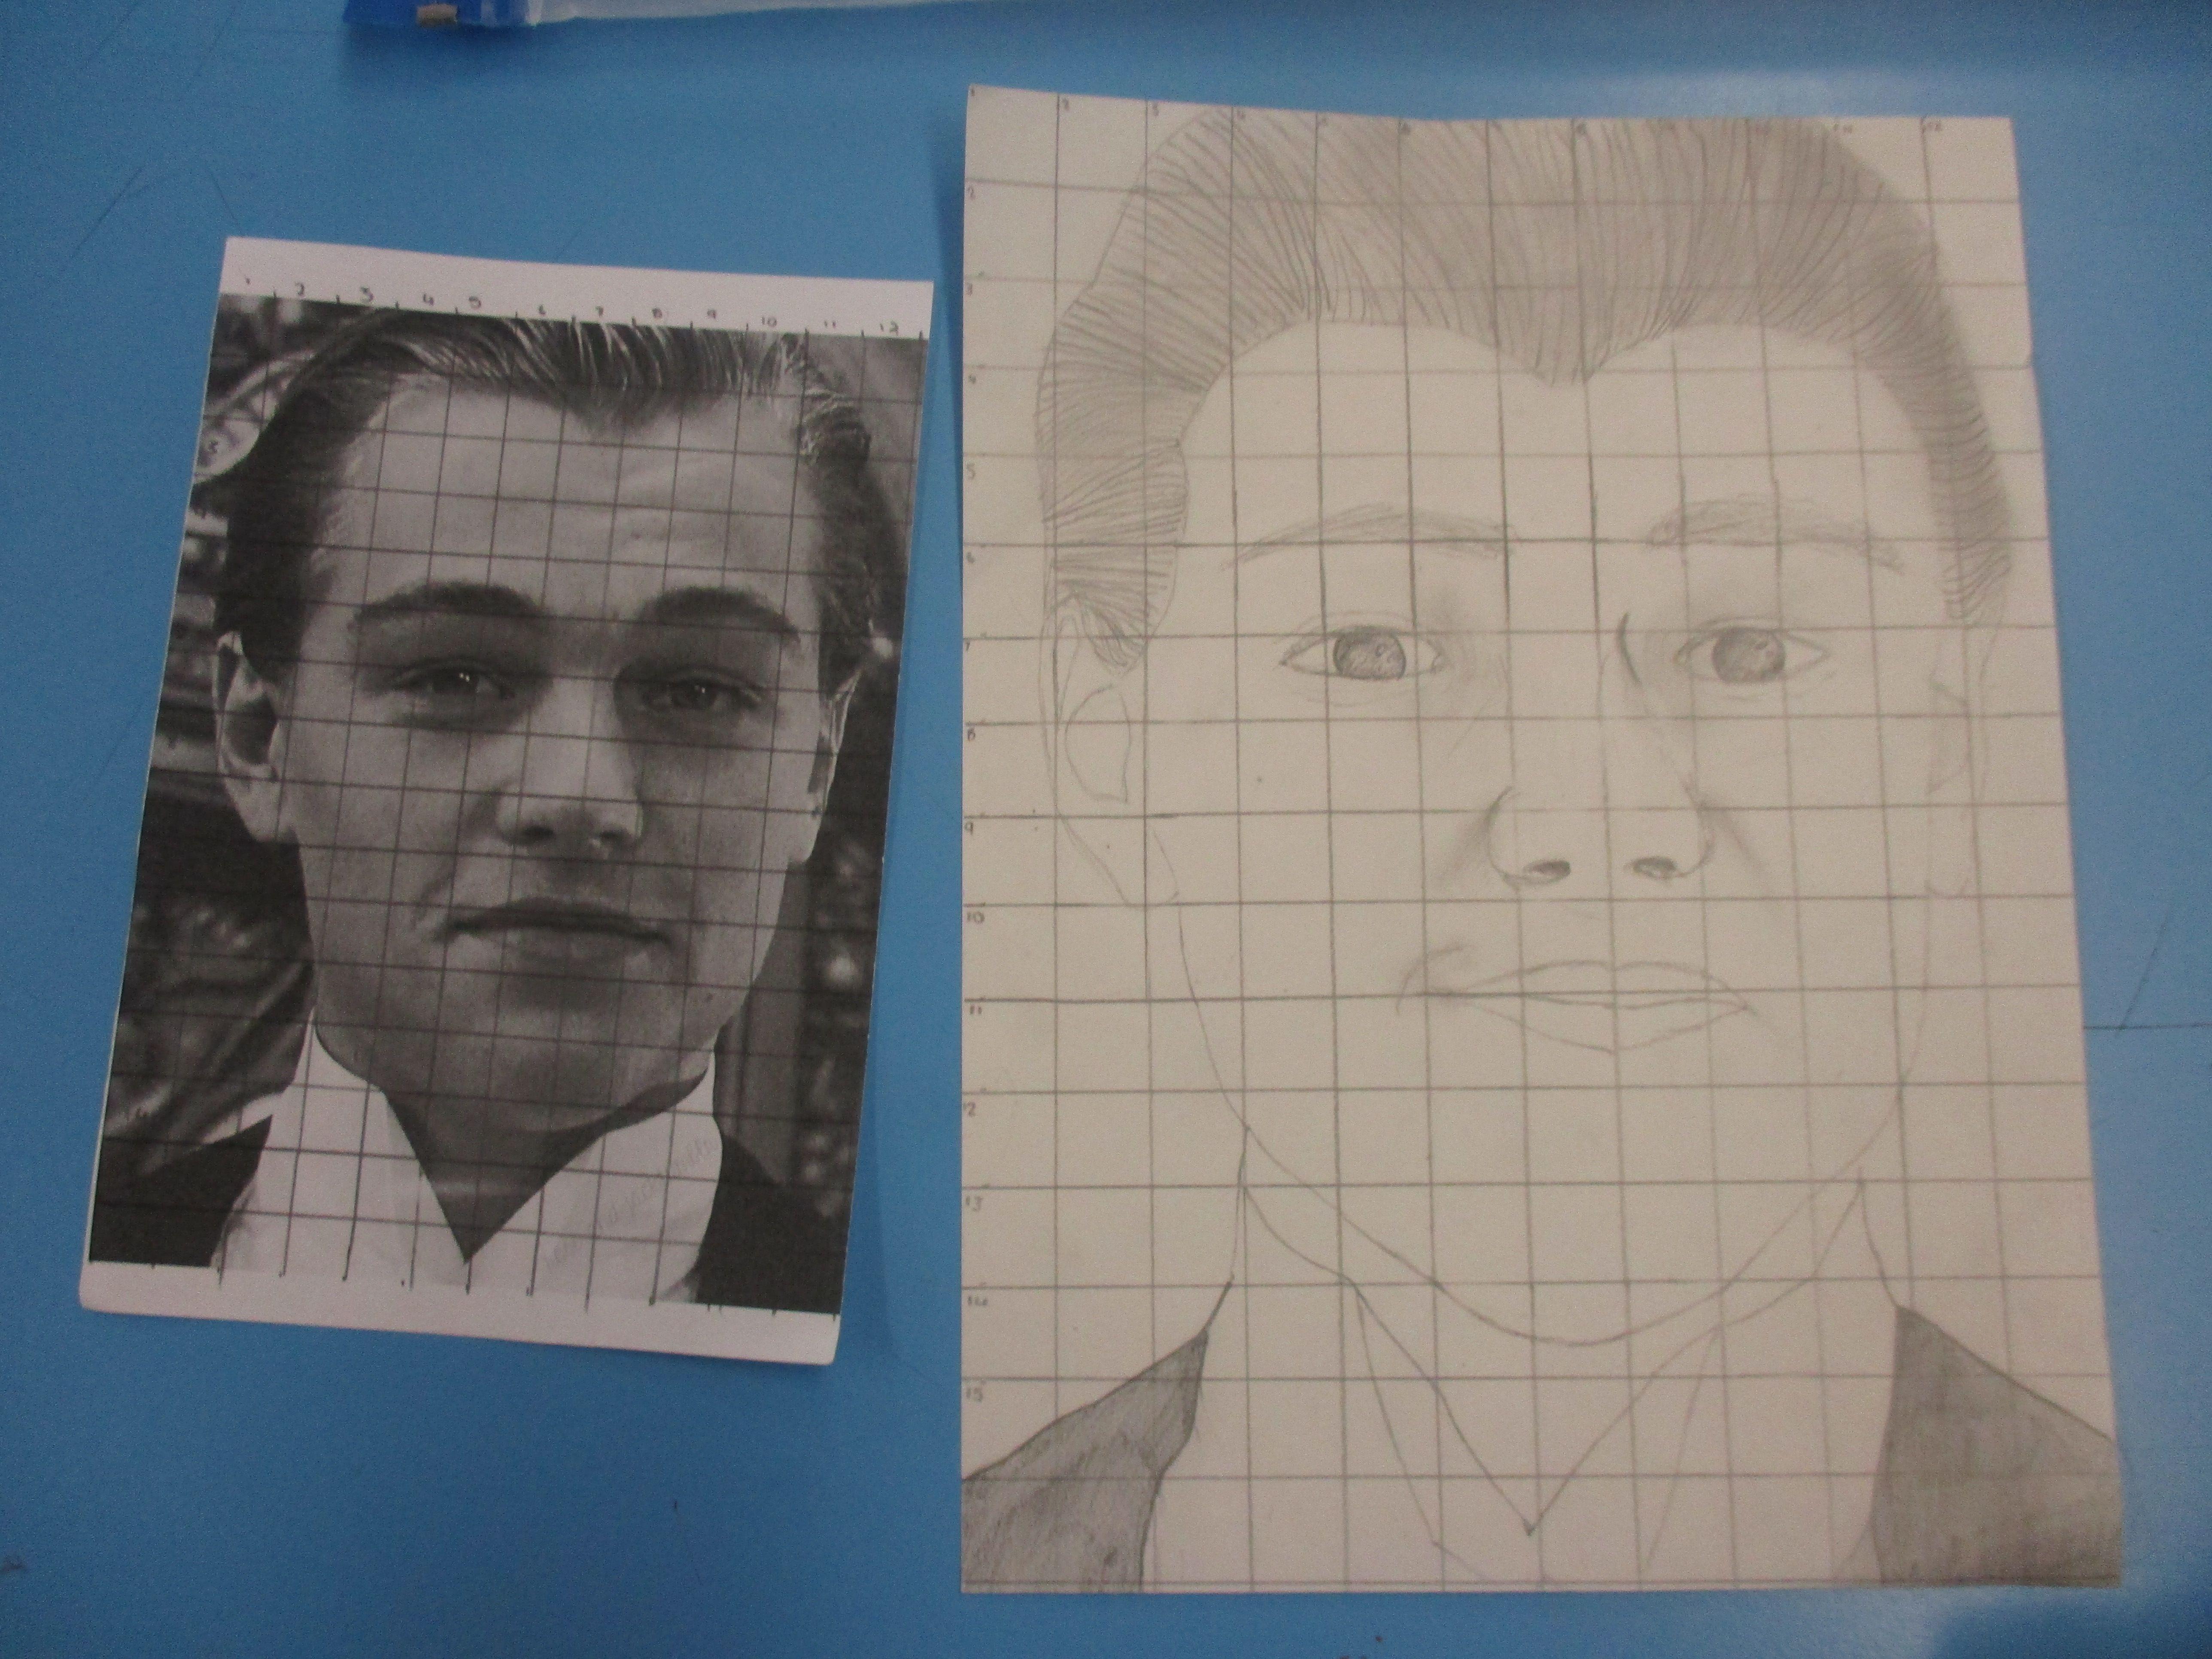 Tonal Drawings Of Portraits Using The Grid Method In